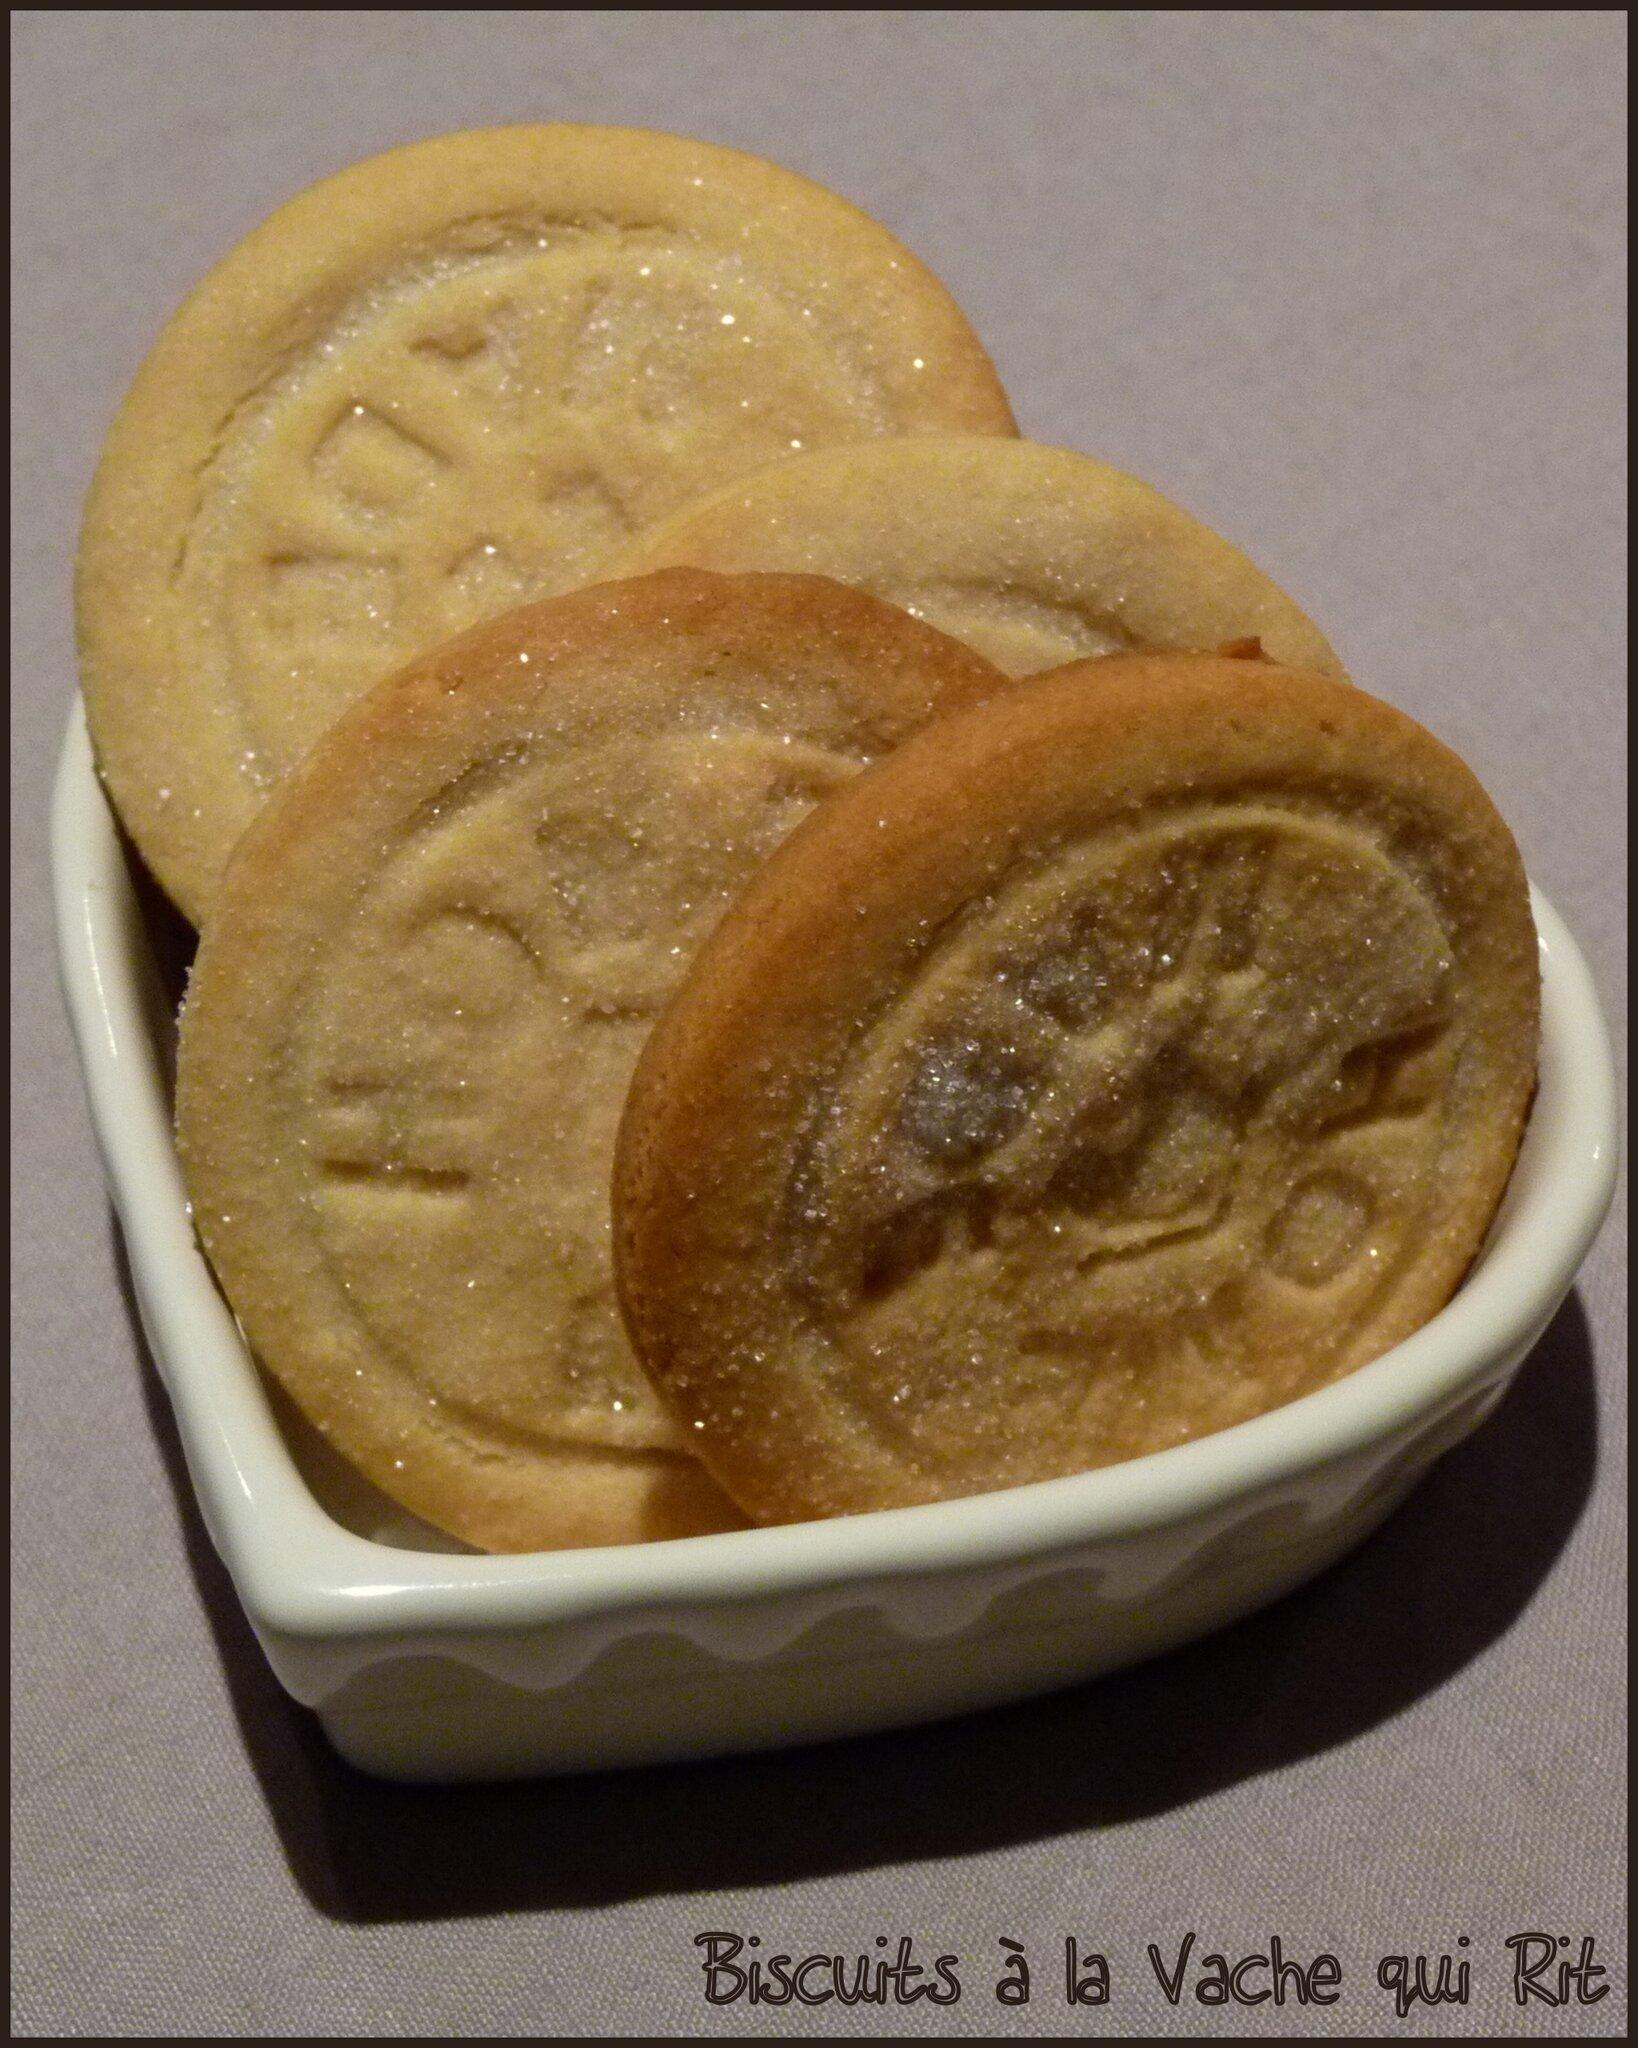 Biscuits à la vache qui rit